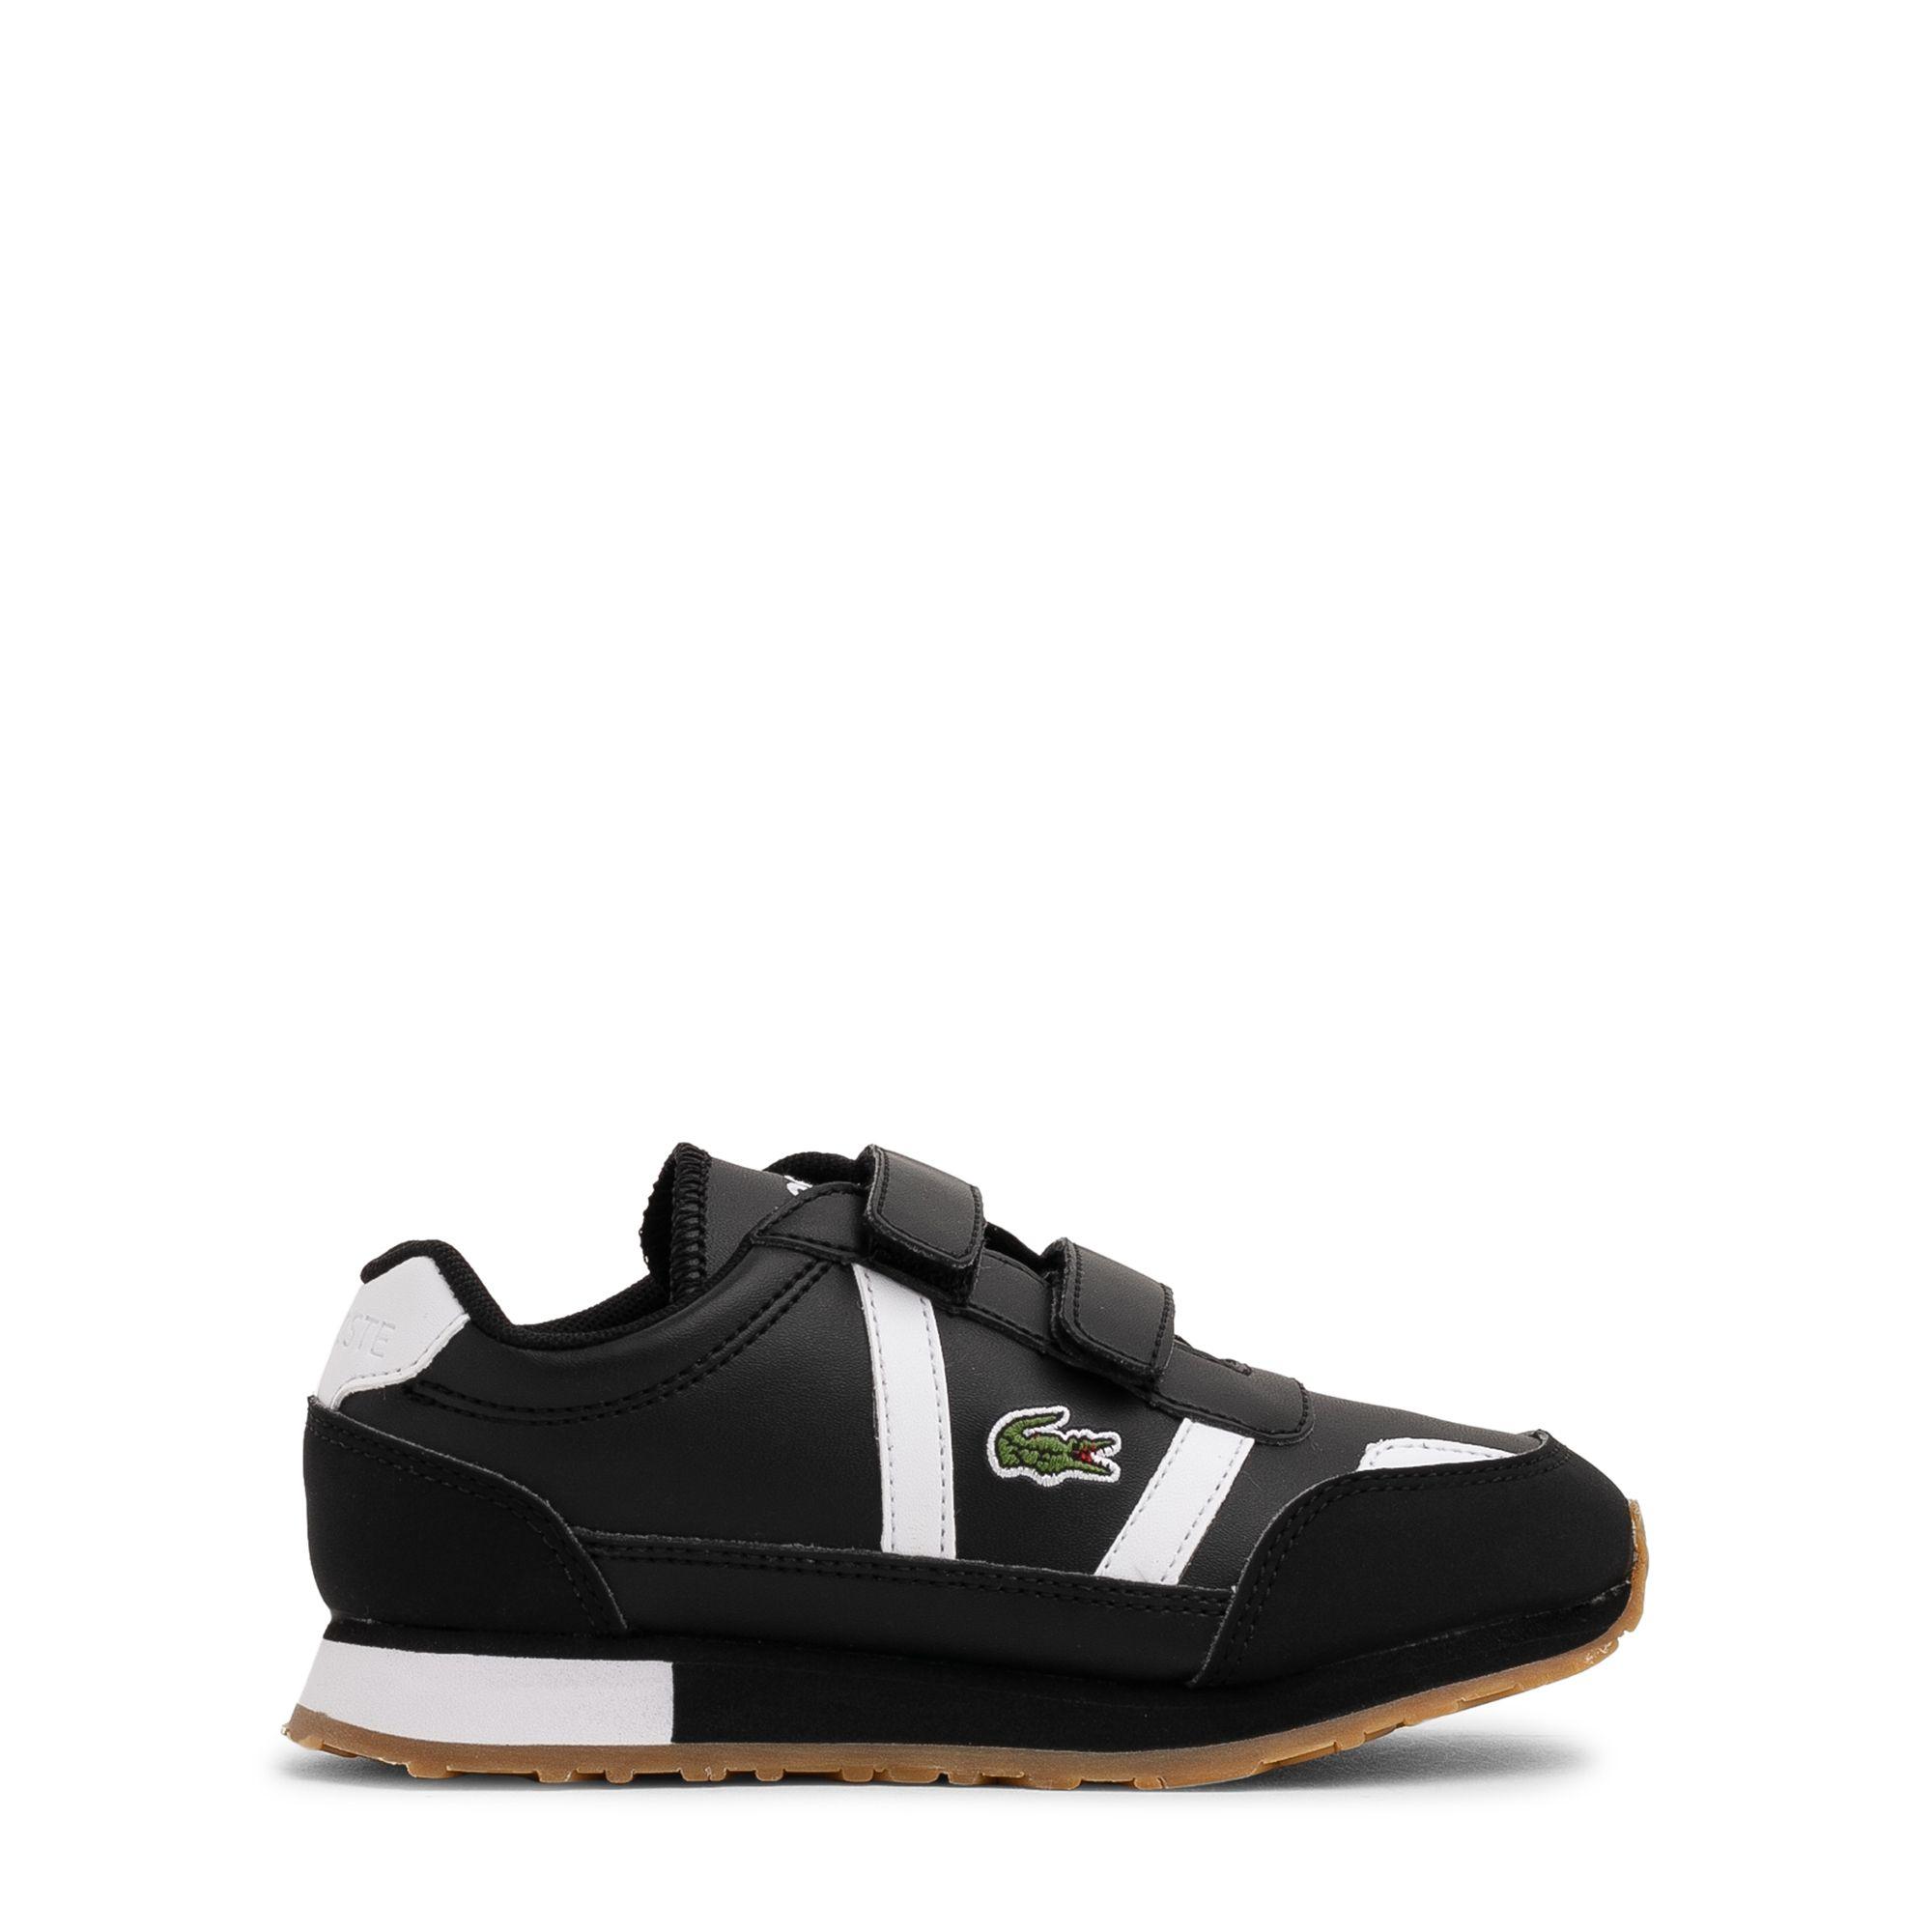 Partner sneakers